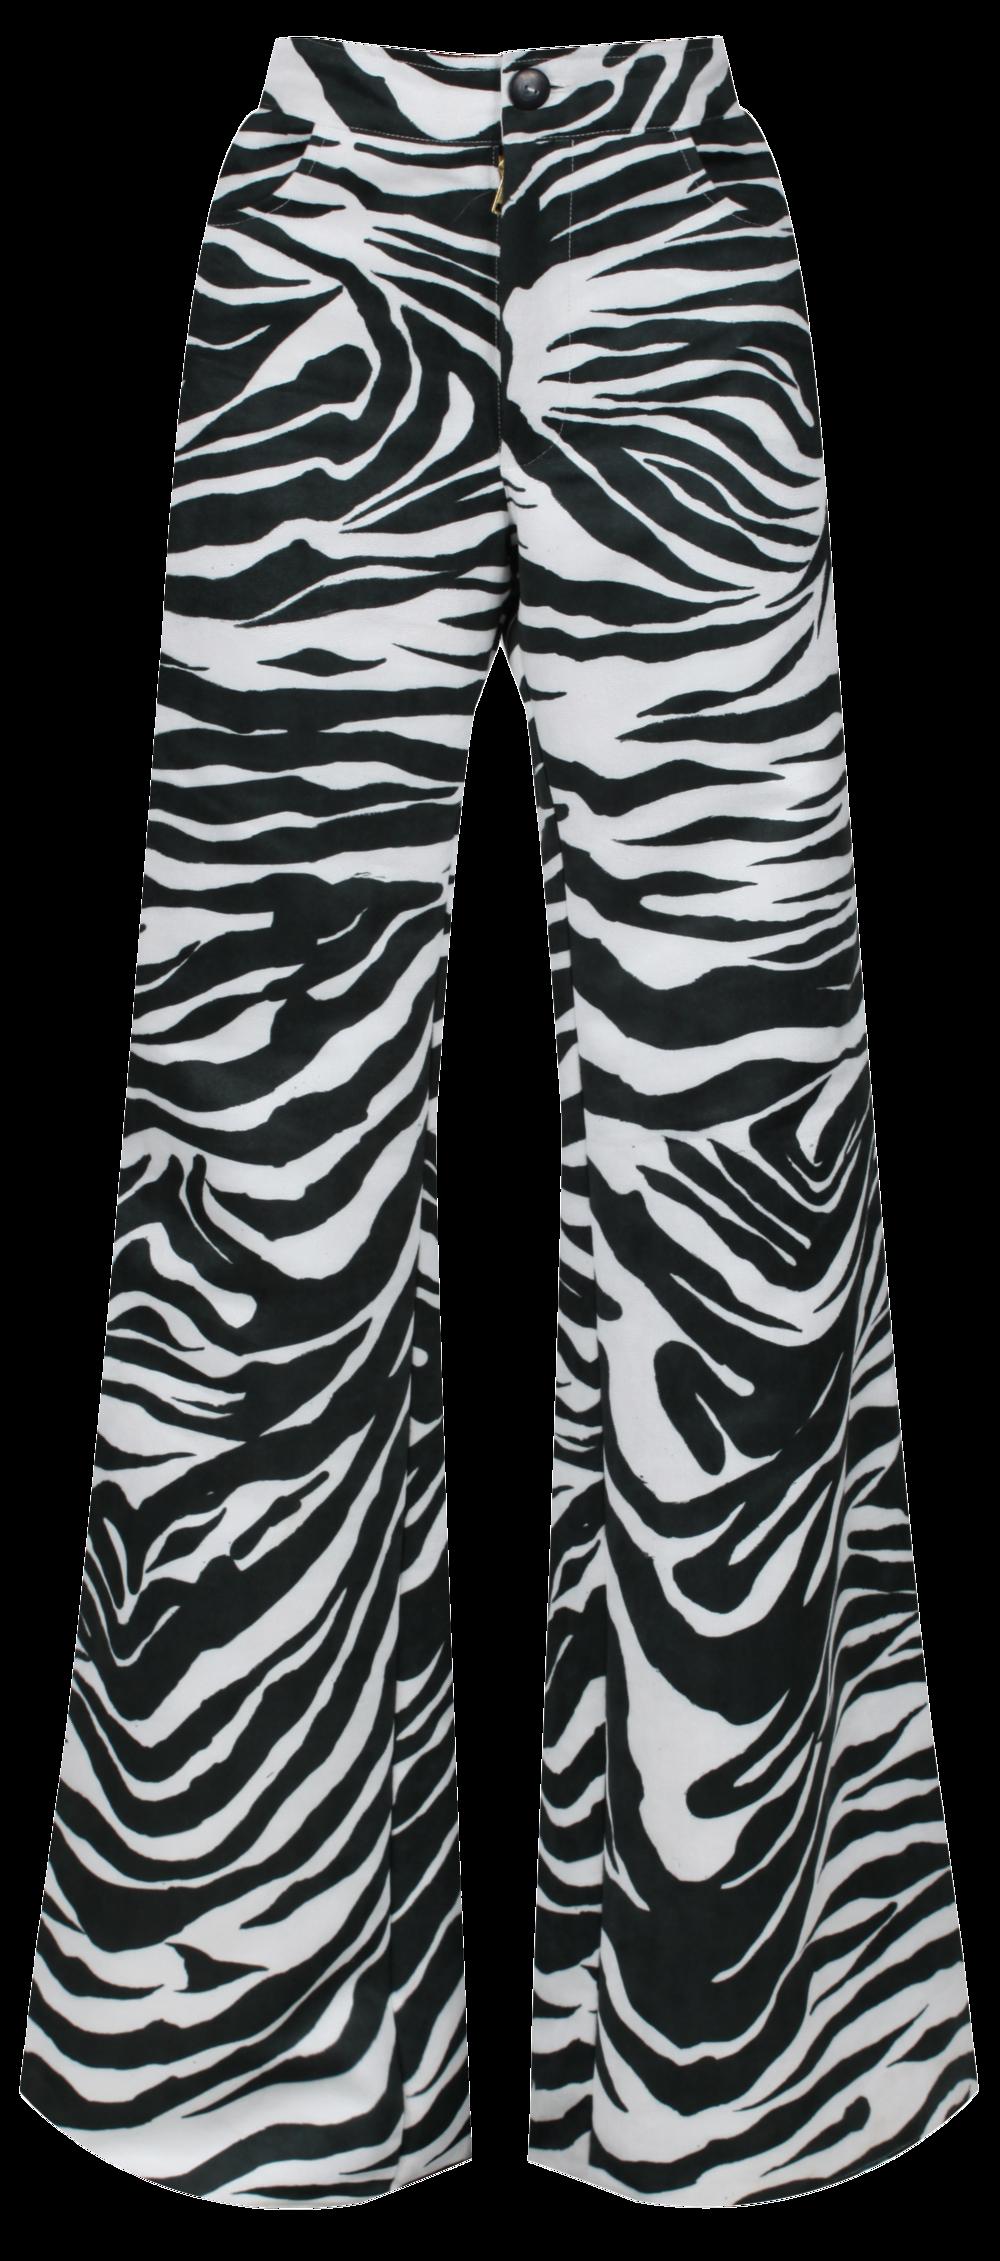 Luna PRINT Trousers - Zany - SHOP NOW